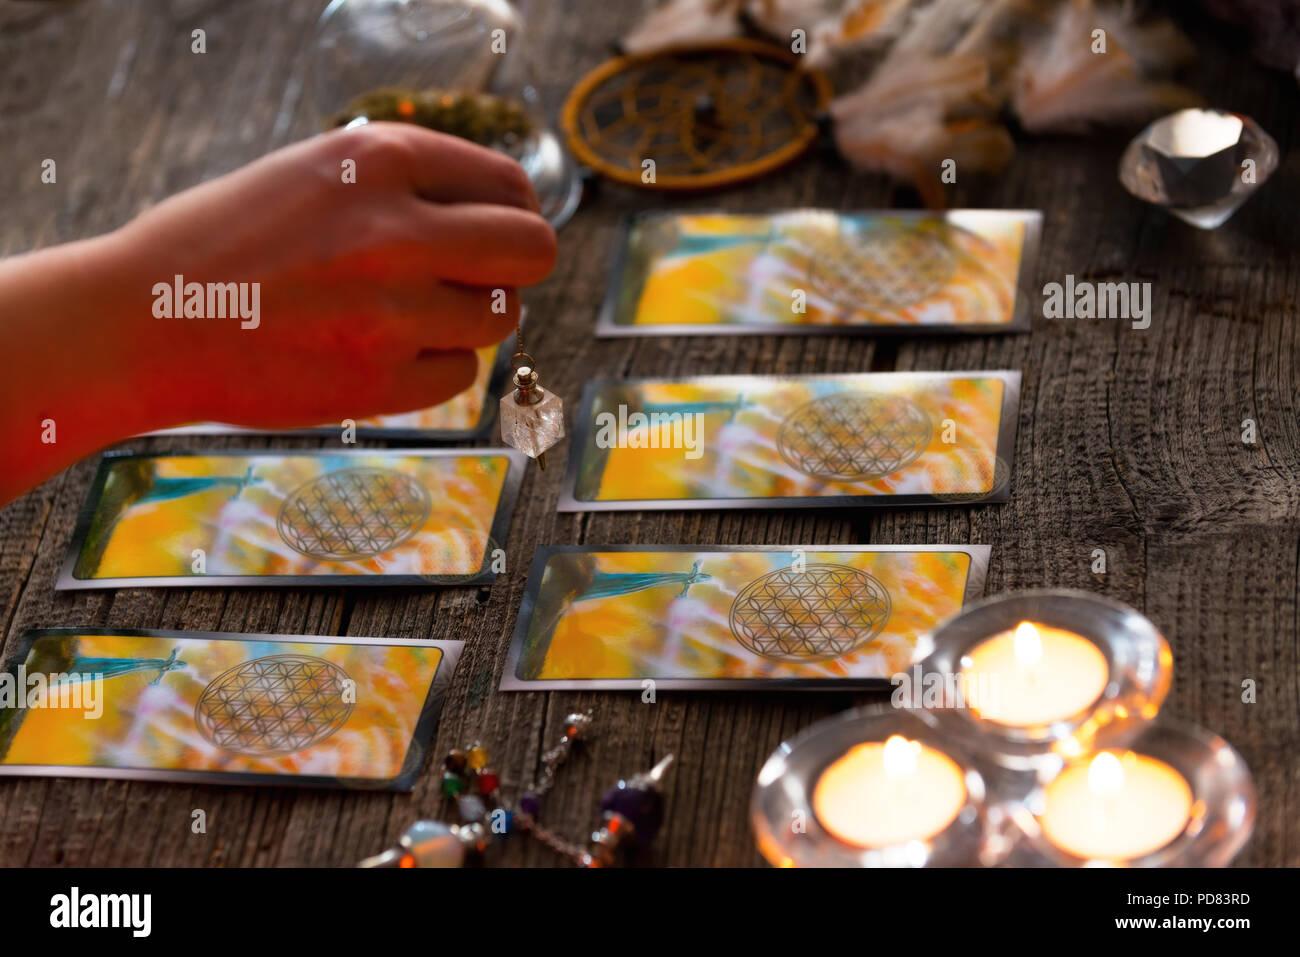 Fortune teller holding a pendulum over tarot cards - Stock Image